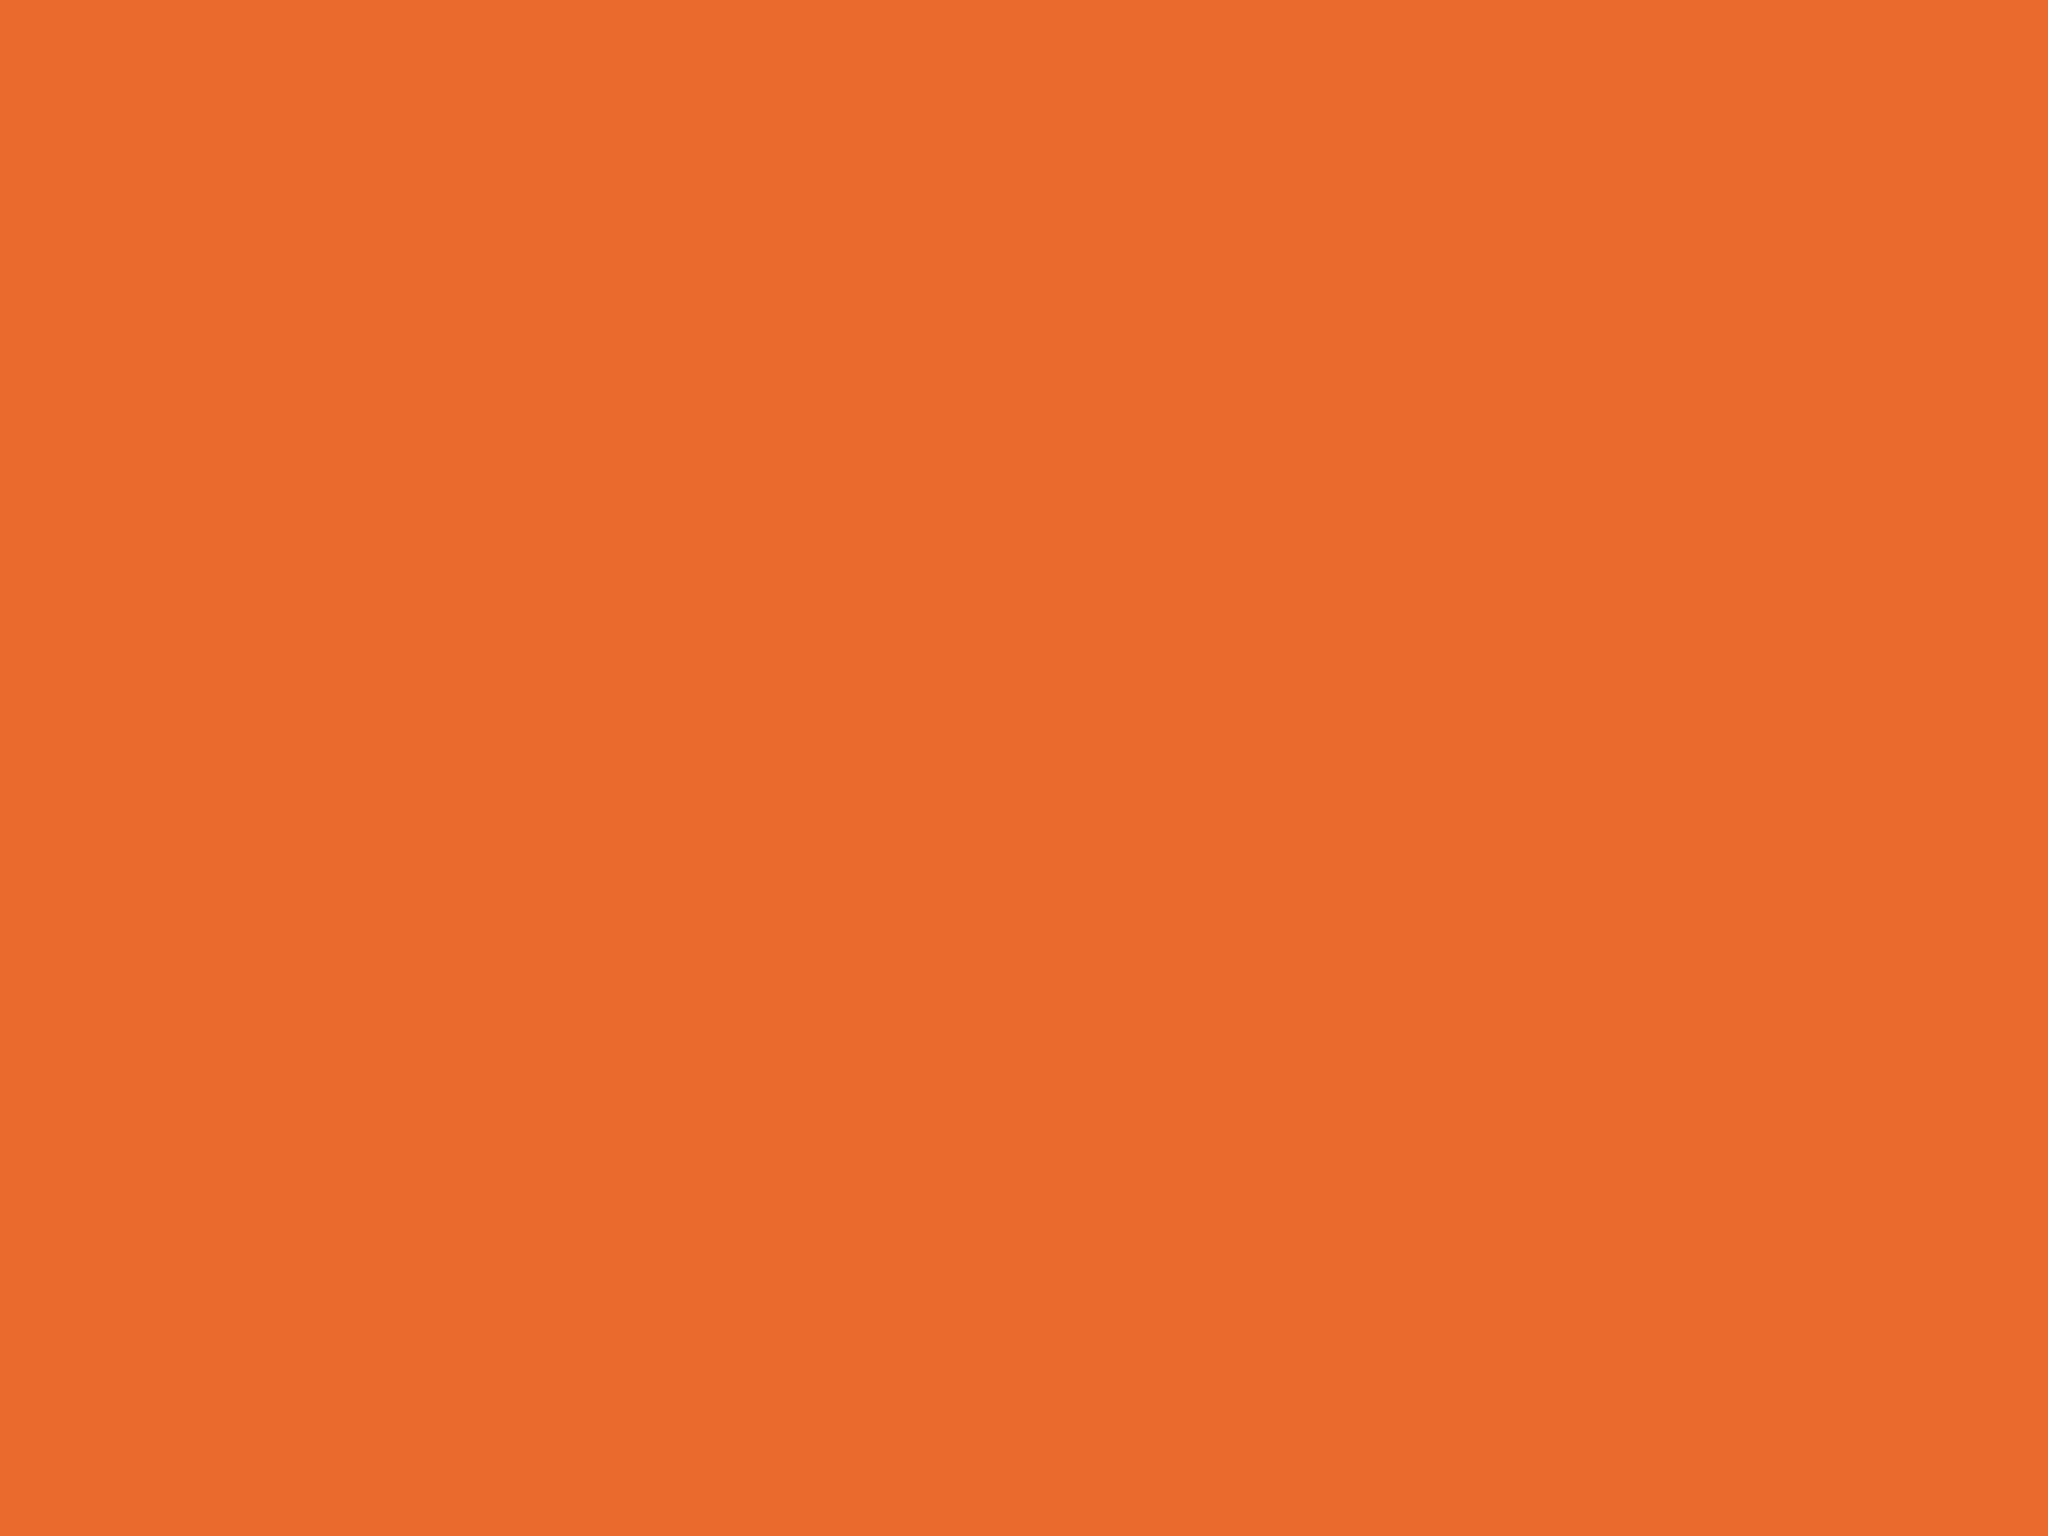 2048x1536 Deep Carrot Orange Solid Color Background